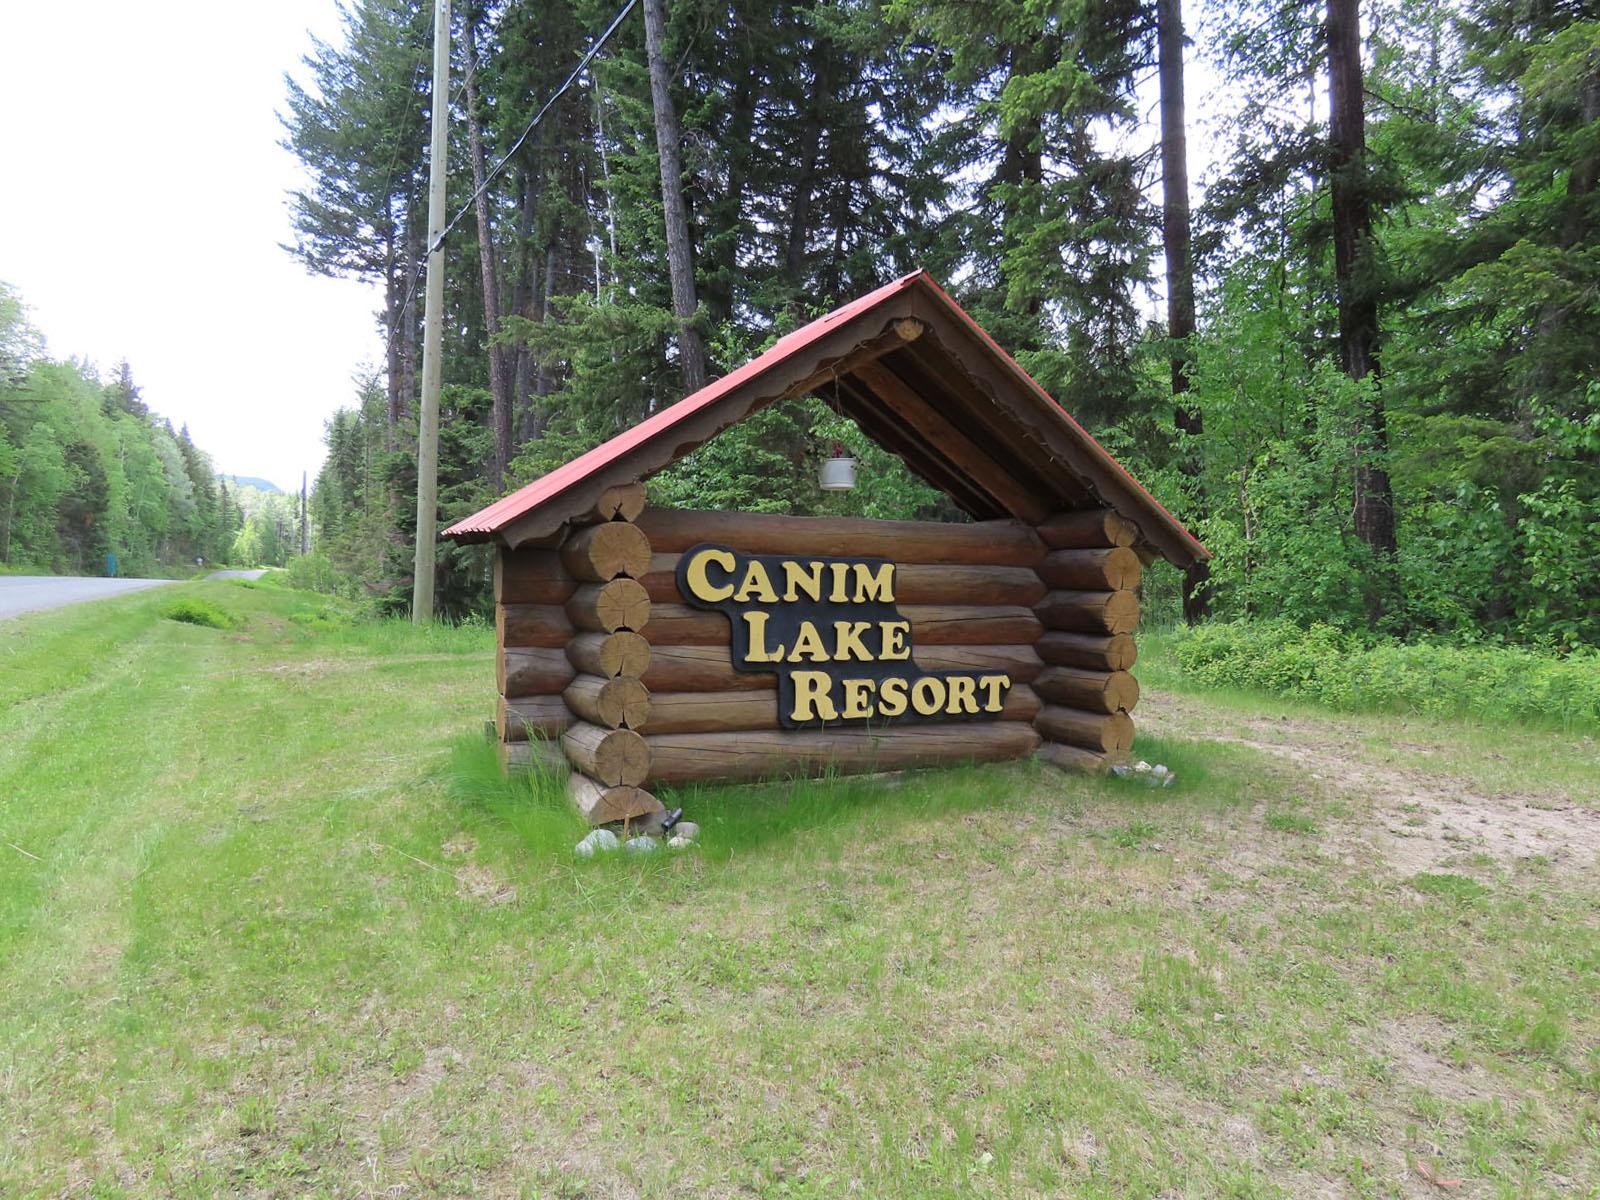 Canim lake resort 76